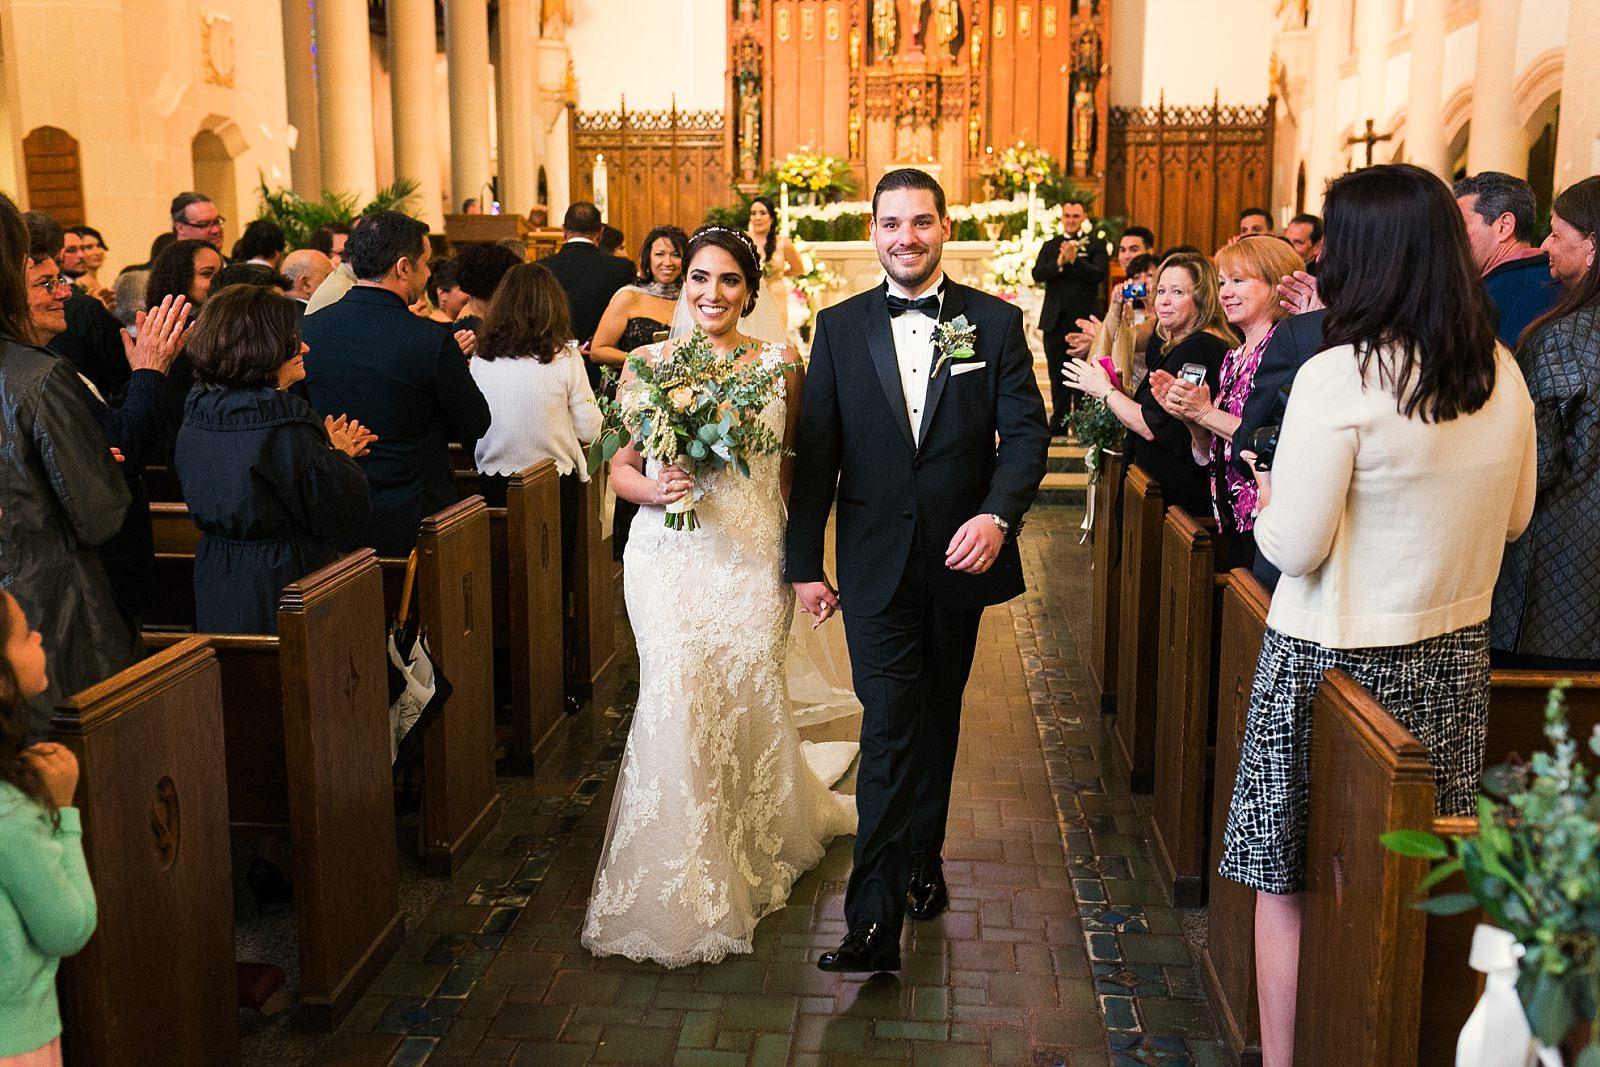 NY_Wedding_Photographer_NiPe_19.jpg